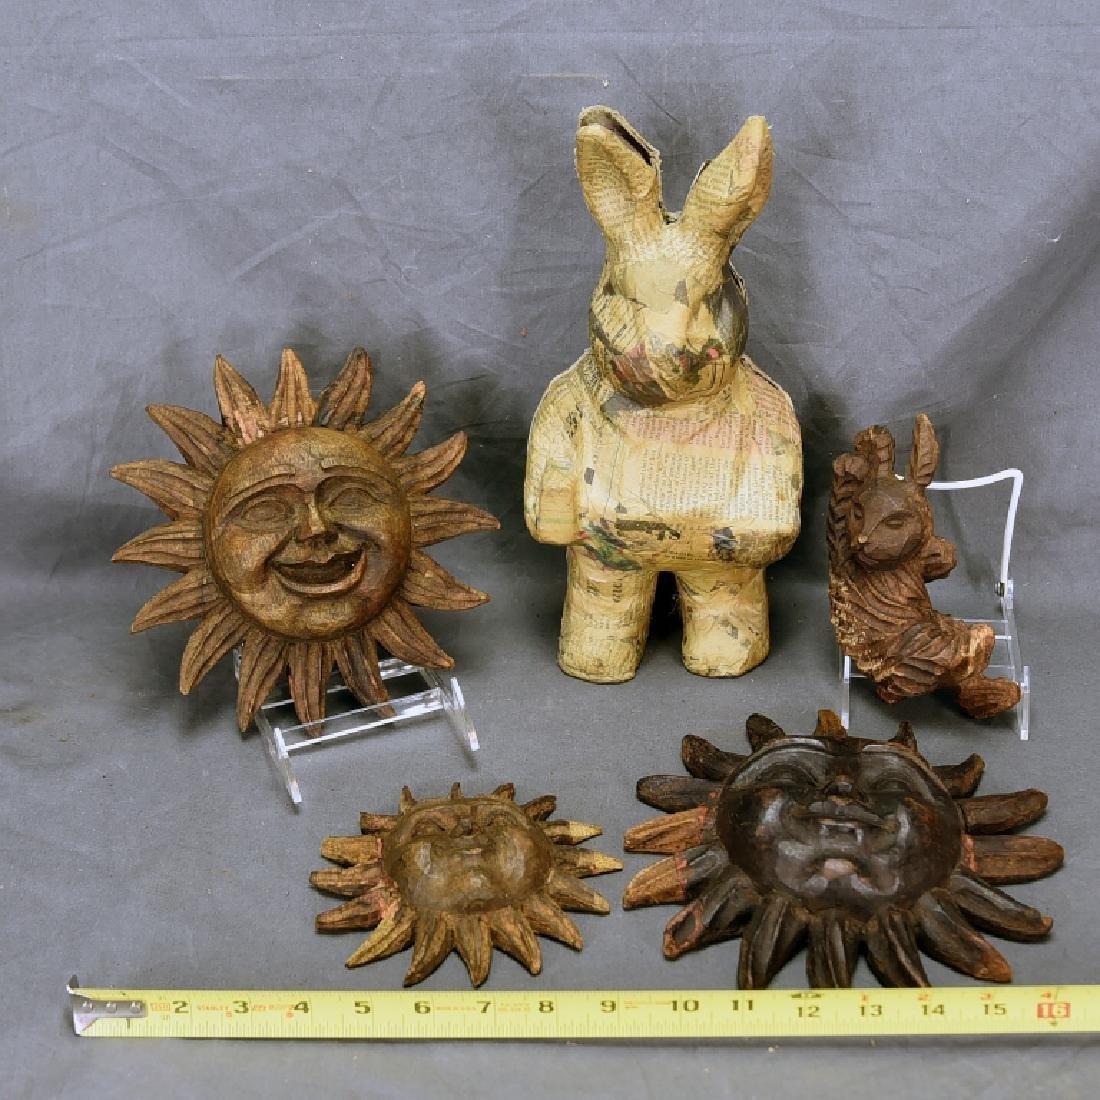 5 Wooden Paper Mache Molds - 2